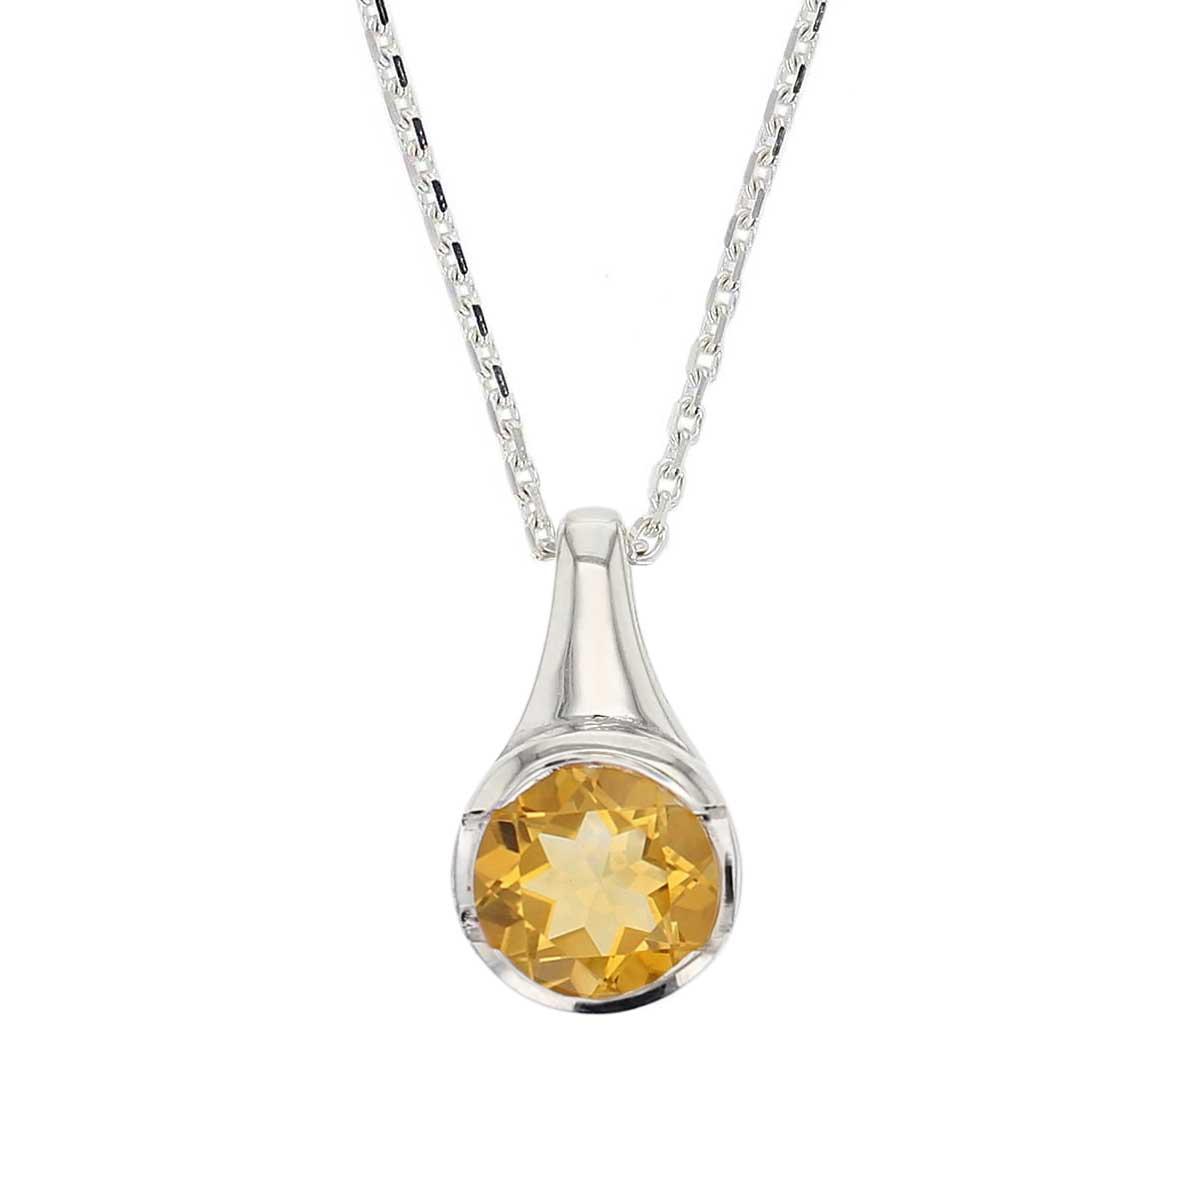 sterling silver round cut faceted citrine gemstone pendant, designer jewellery, yellow quartz gem, jewelry, handmade by Faller, Londonderry, Northern Ireland, Irish hand crafted, darcy, D'arcy